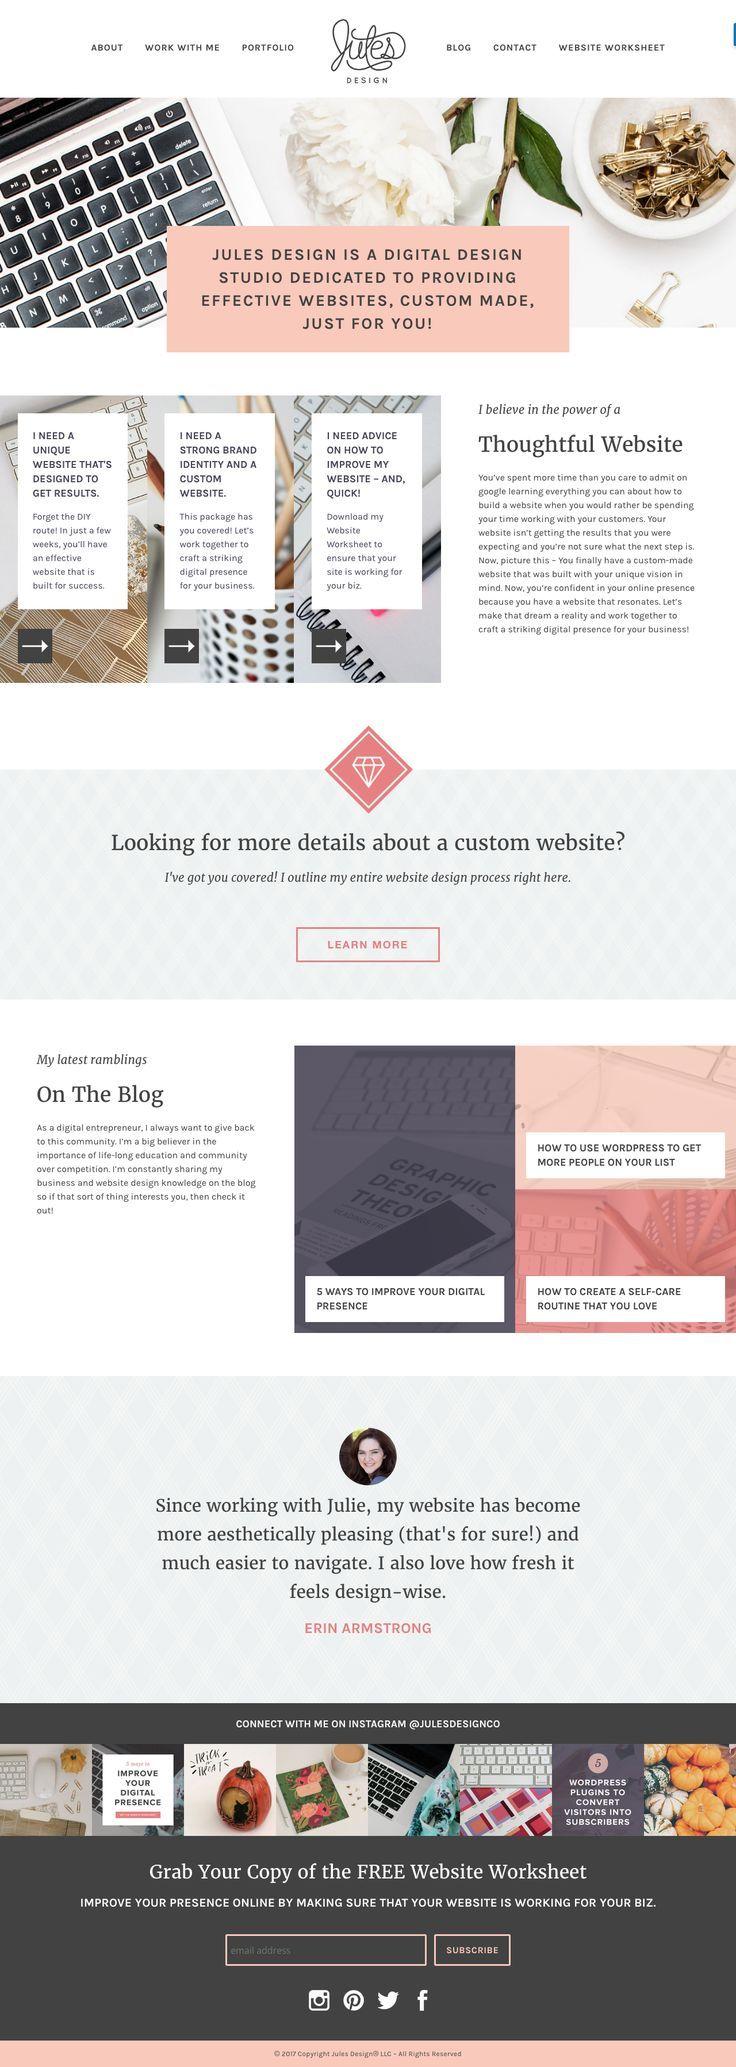 84 best Inspiring Design Ideas images on Pinterest   Advice ...